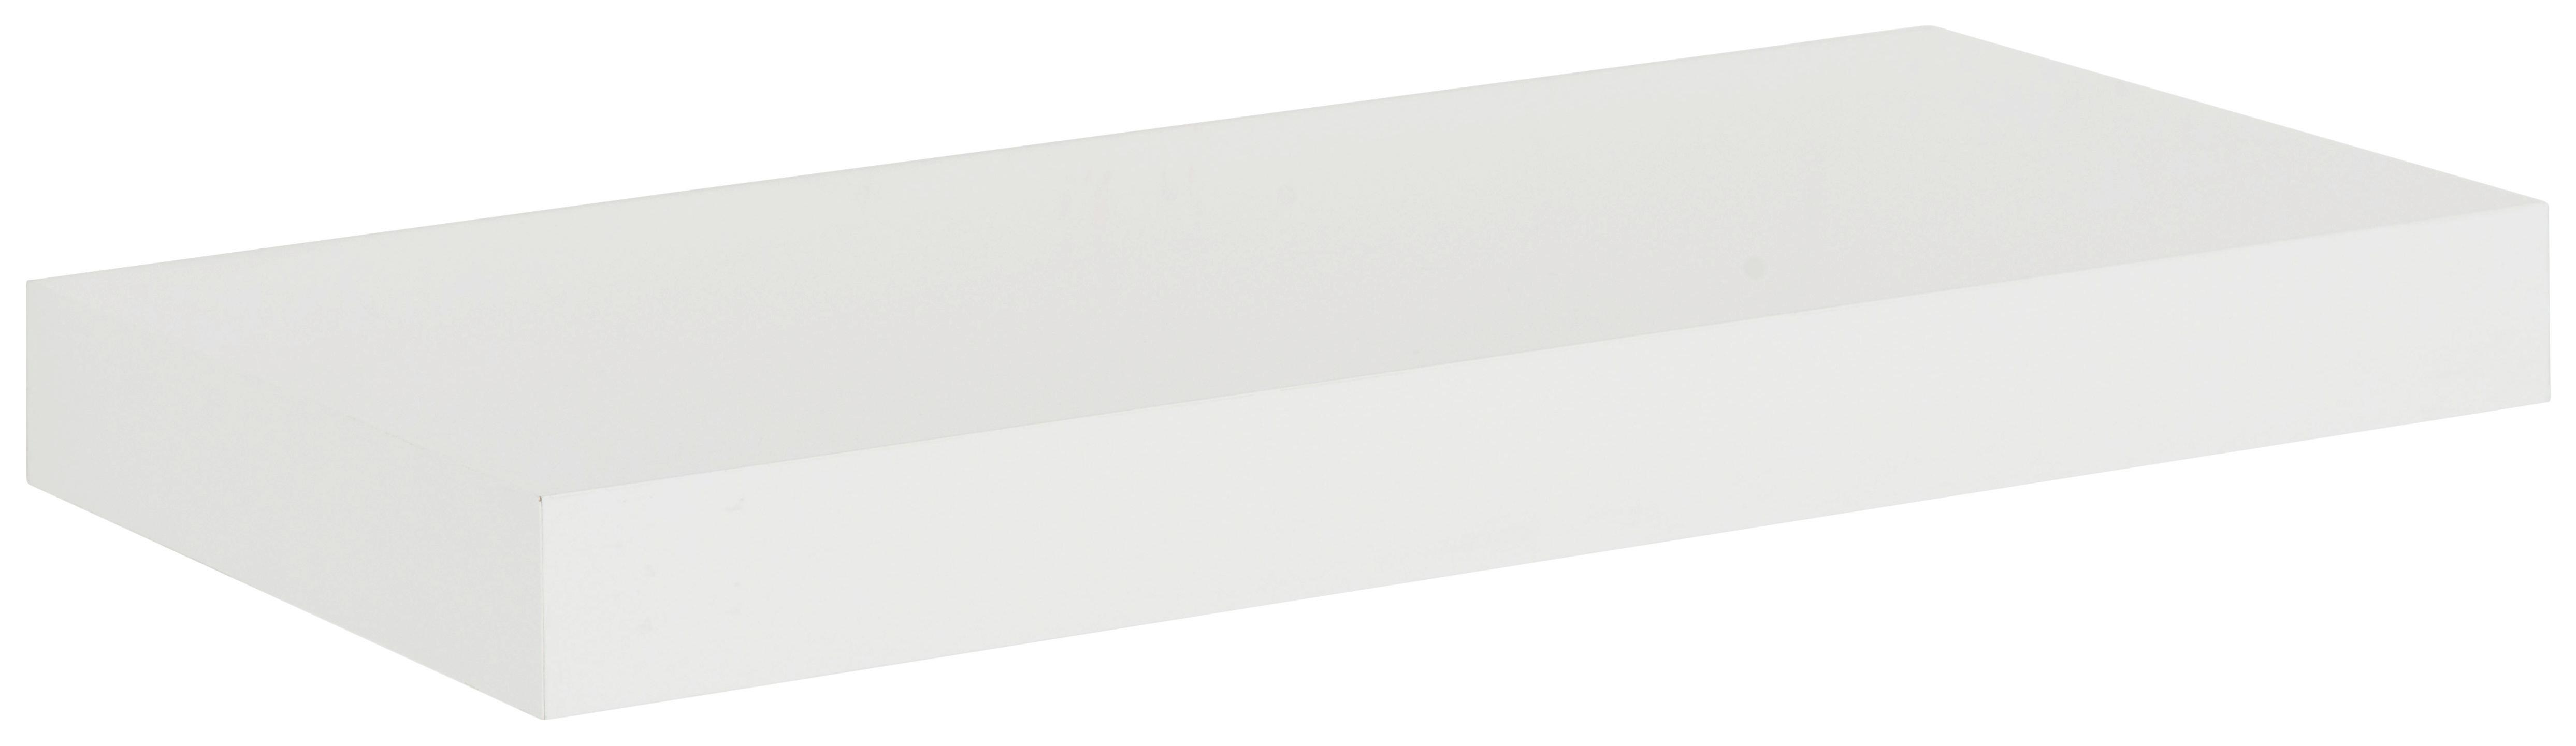 Wandboard in Weiß - Weiß, Basics, Holz (100/4/24cm) - MÖMAX modern living